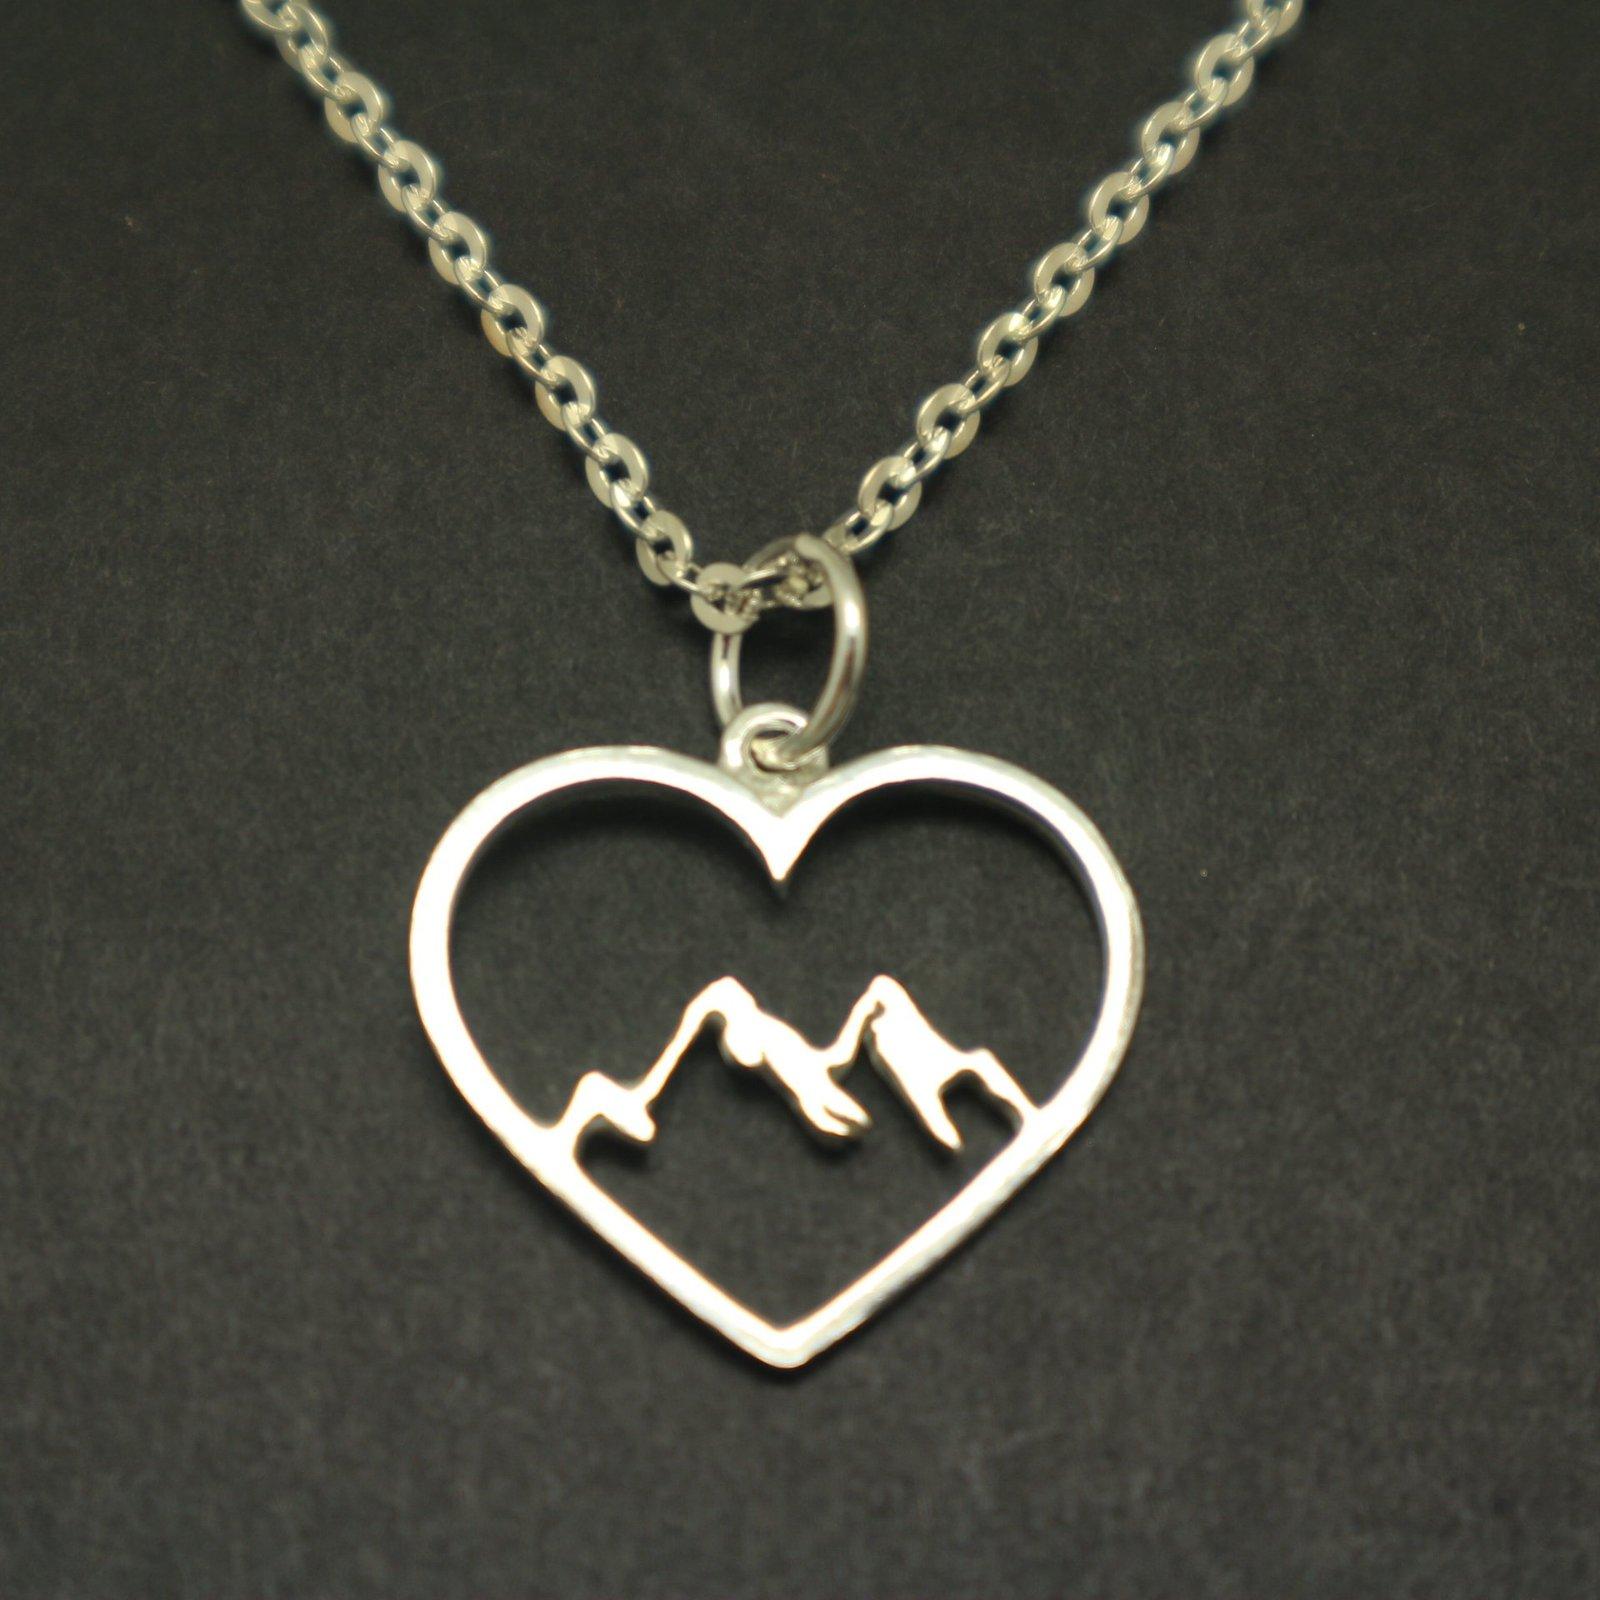 Mountain Range Heart Necklace Pendant